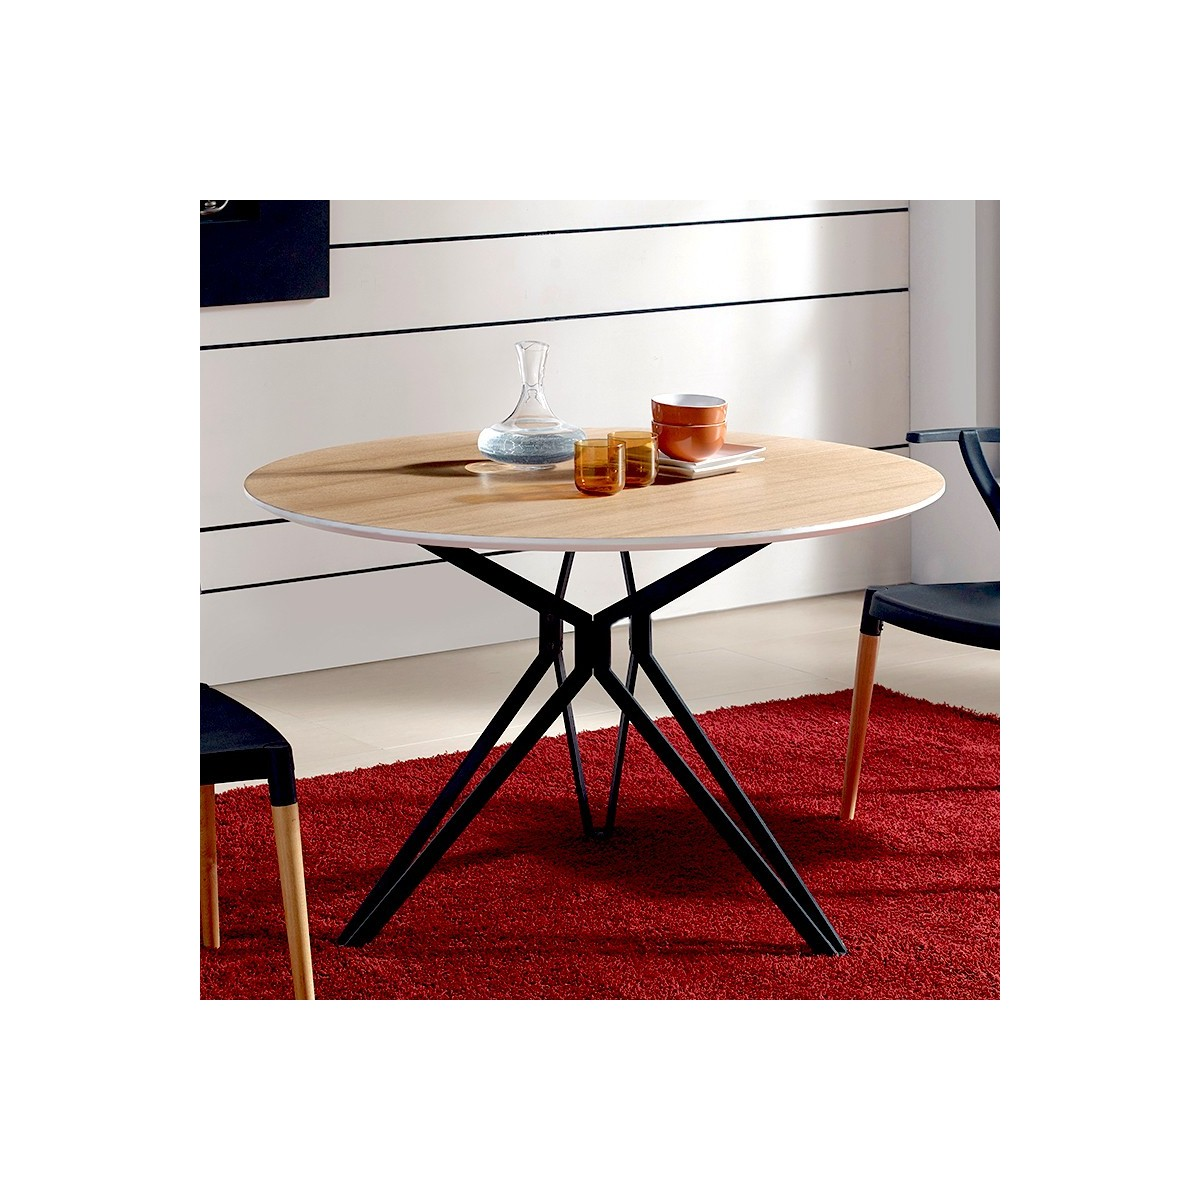 table a manger state ronde pietement noir. Black Bedroom Furniture Sets. Home Design Ideas